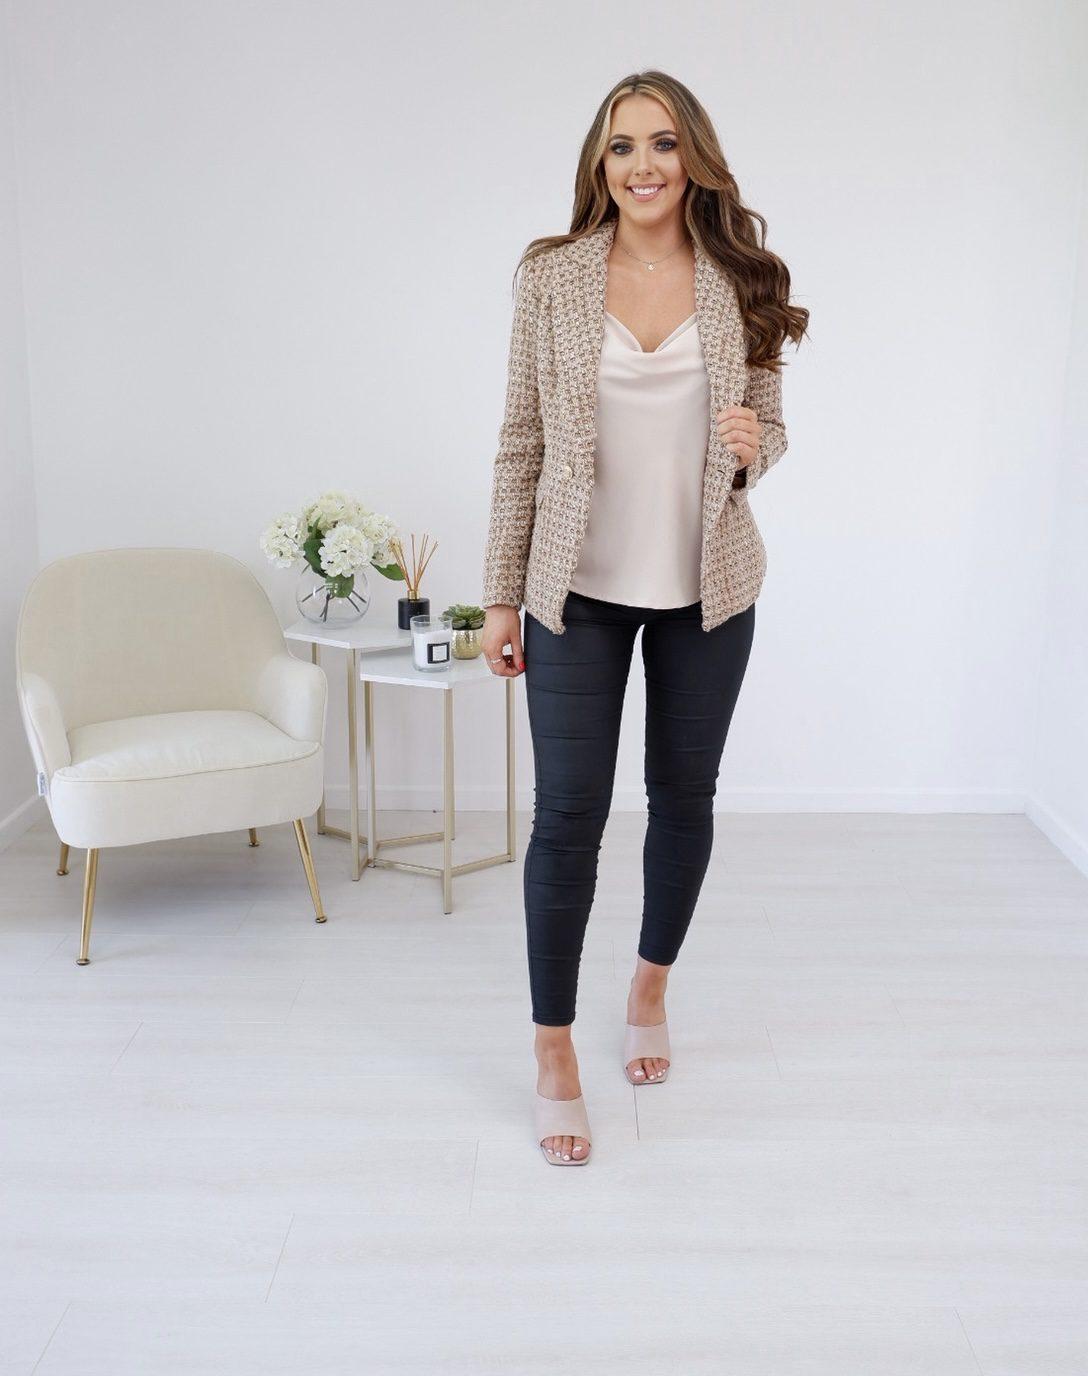 Maisie – Classic Luxe Tan, Nude & Metallic Bronze Thread Tweed Blazer produ